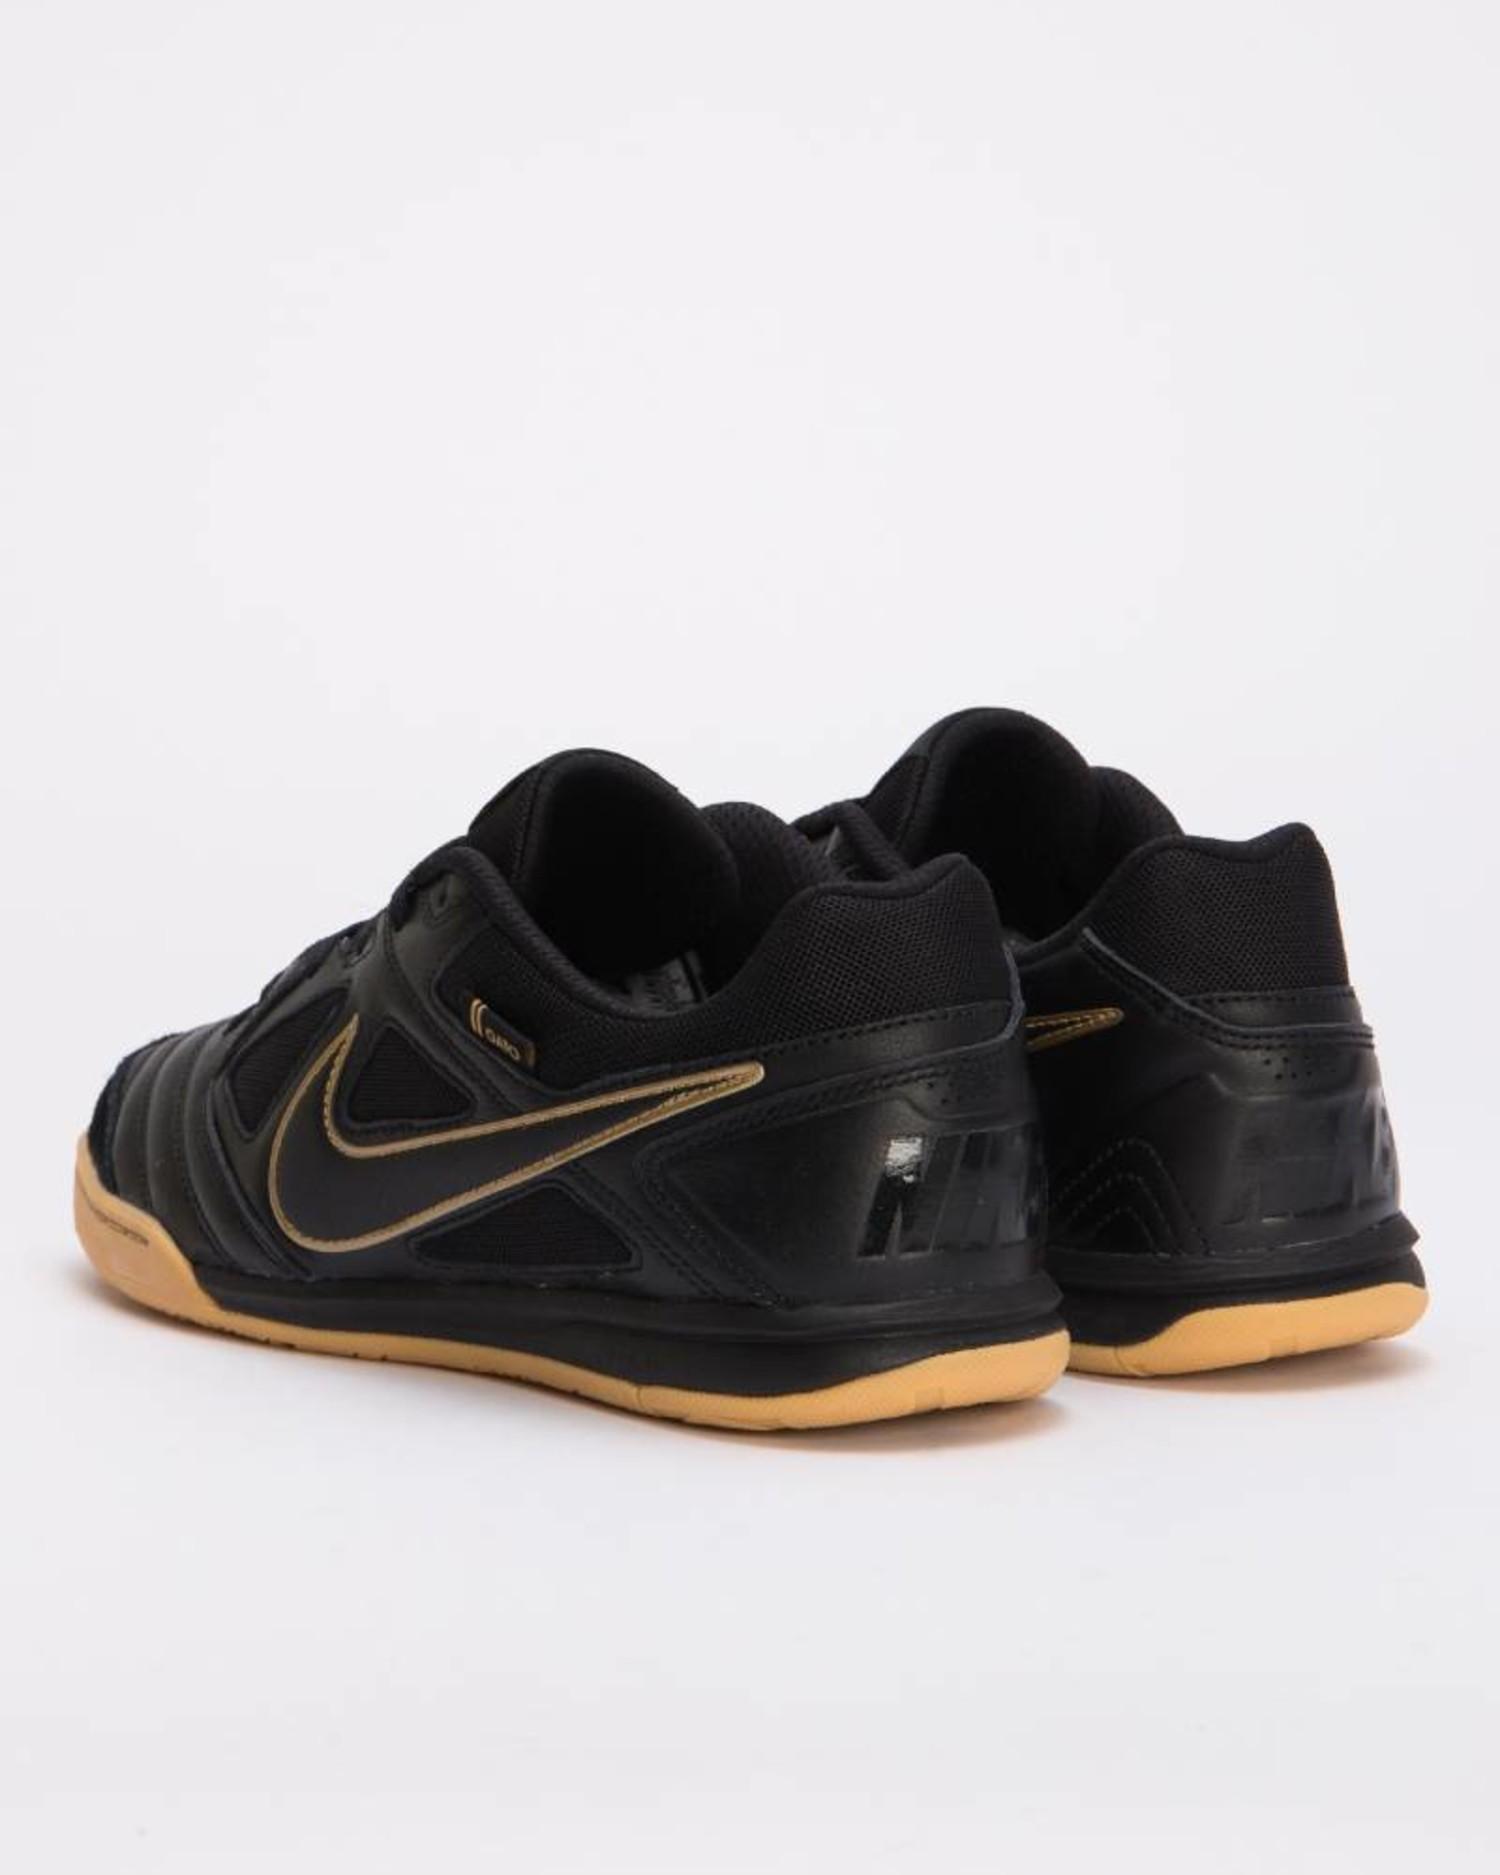 Nike Sb Gato Black/black-metallic gold-gum yellow